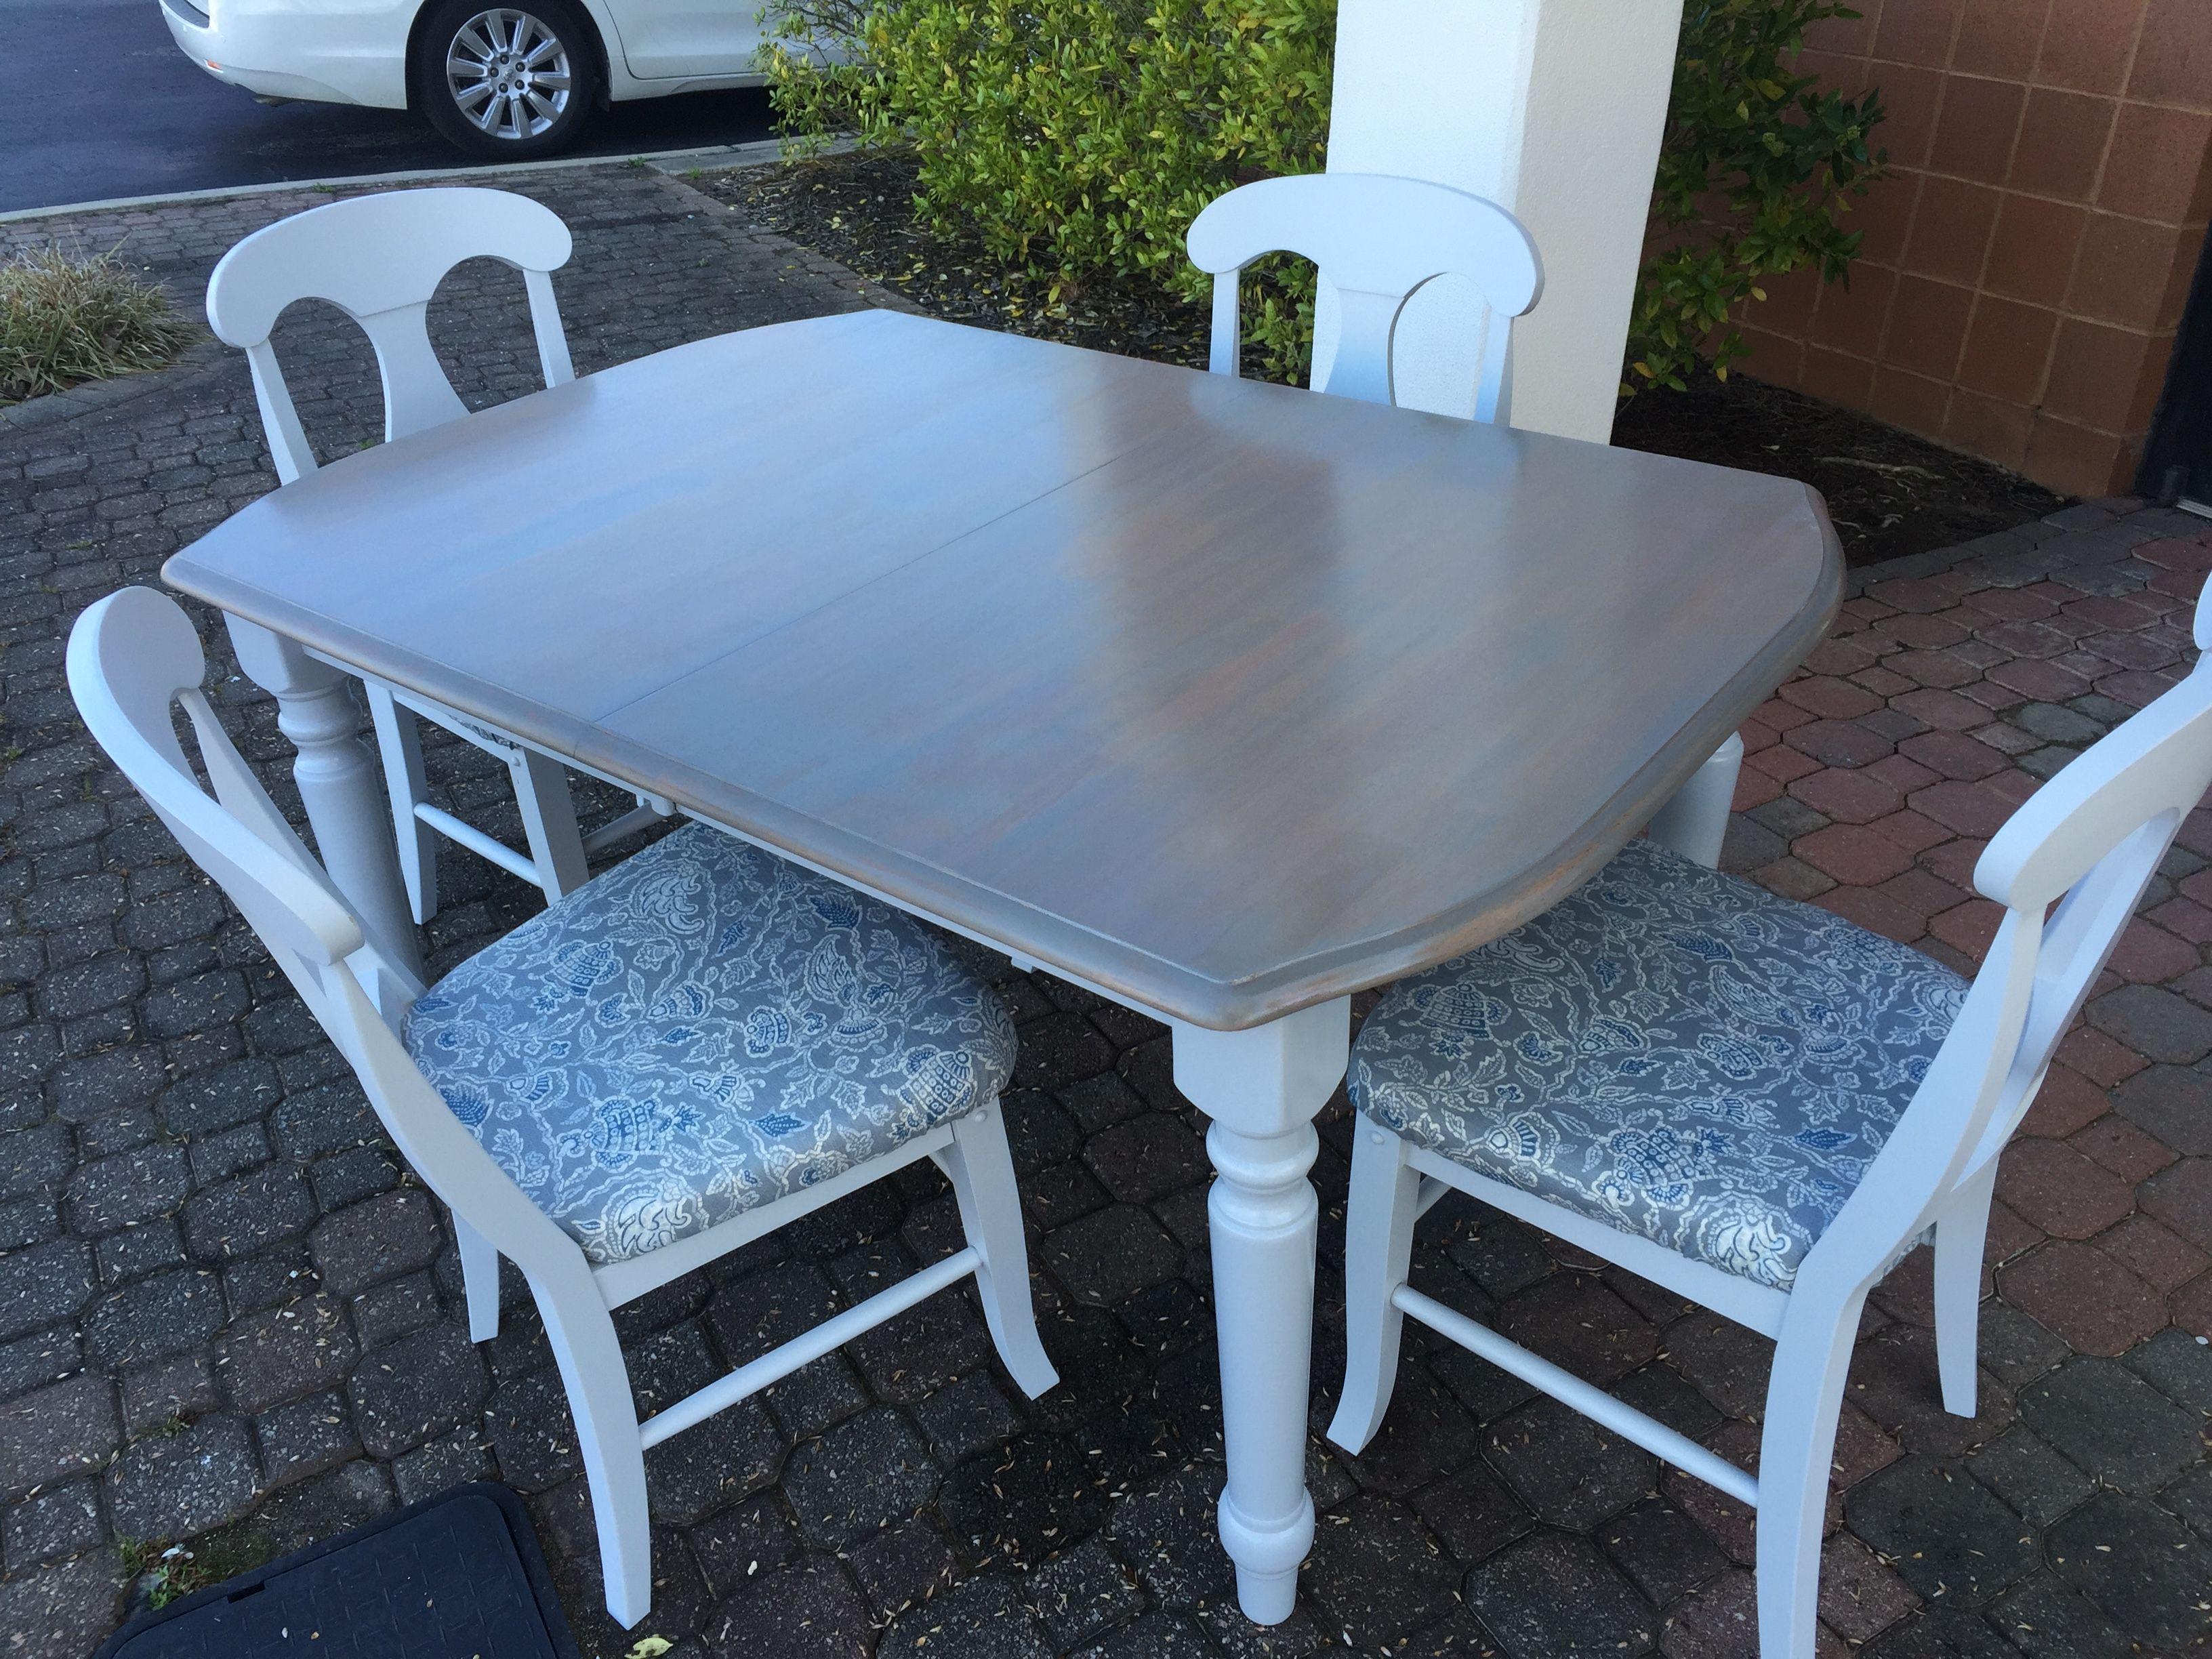 Rock Maple Kitchen Chairs   http://sodakaustica.com   Pinterest